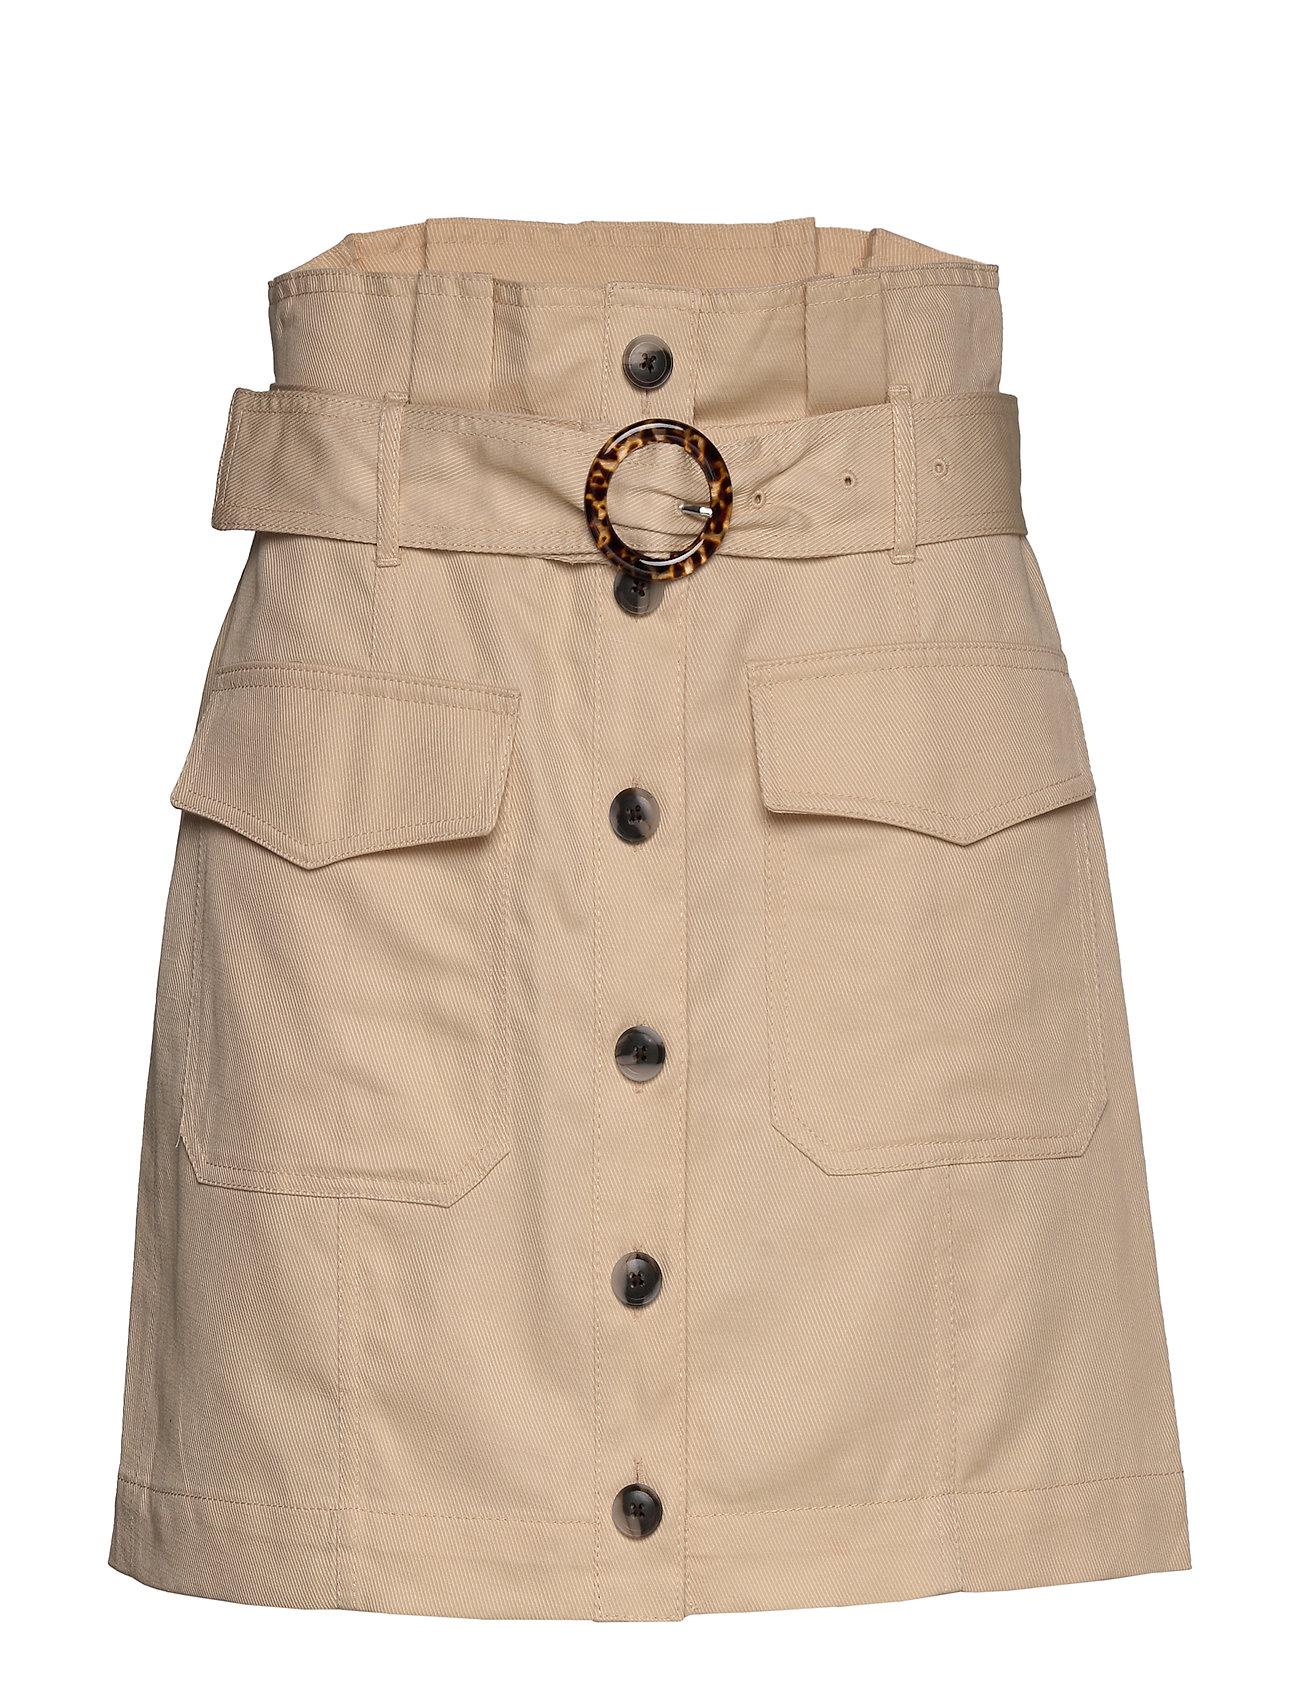 Banana Republic - Paperbag Utility Skirt - short skirts - ecru - 0